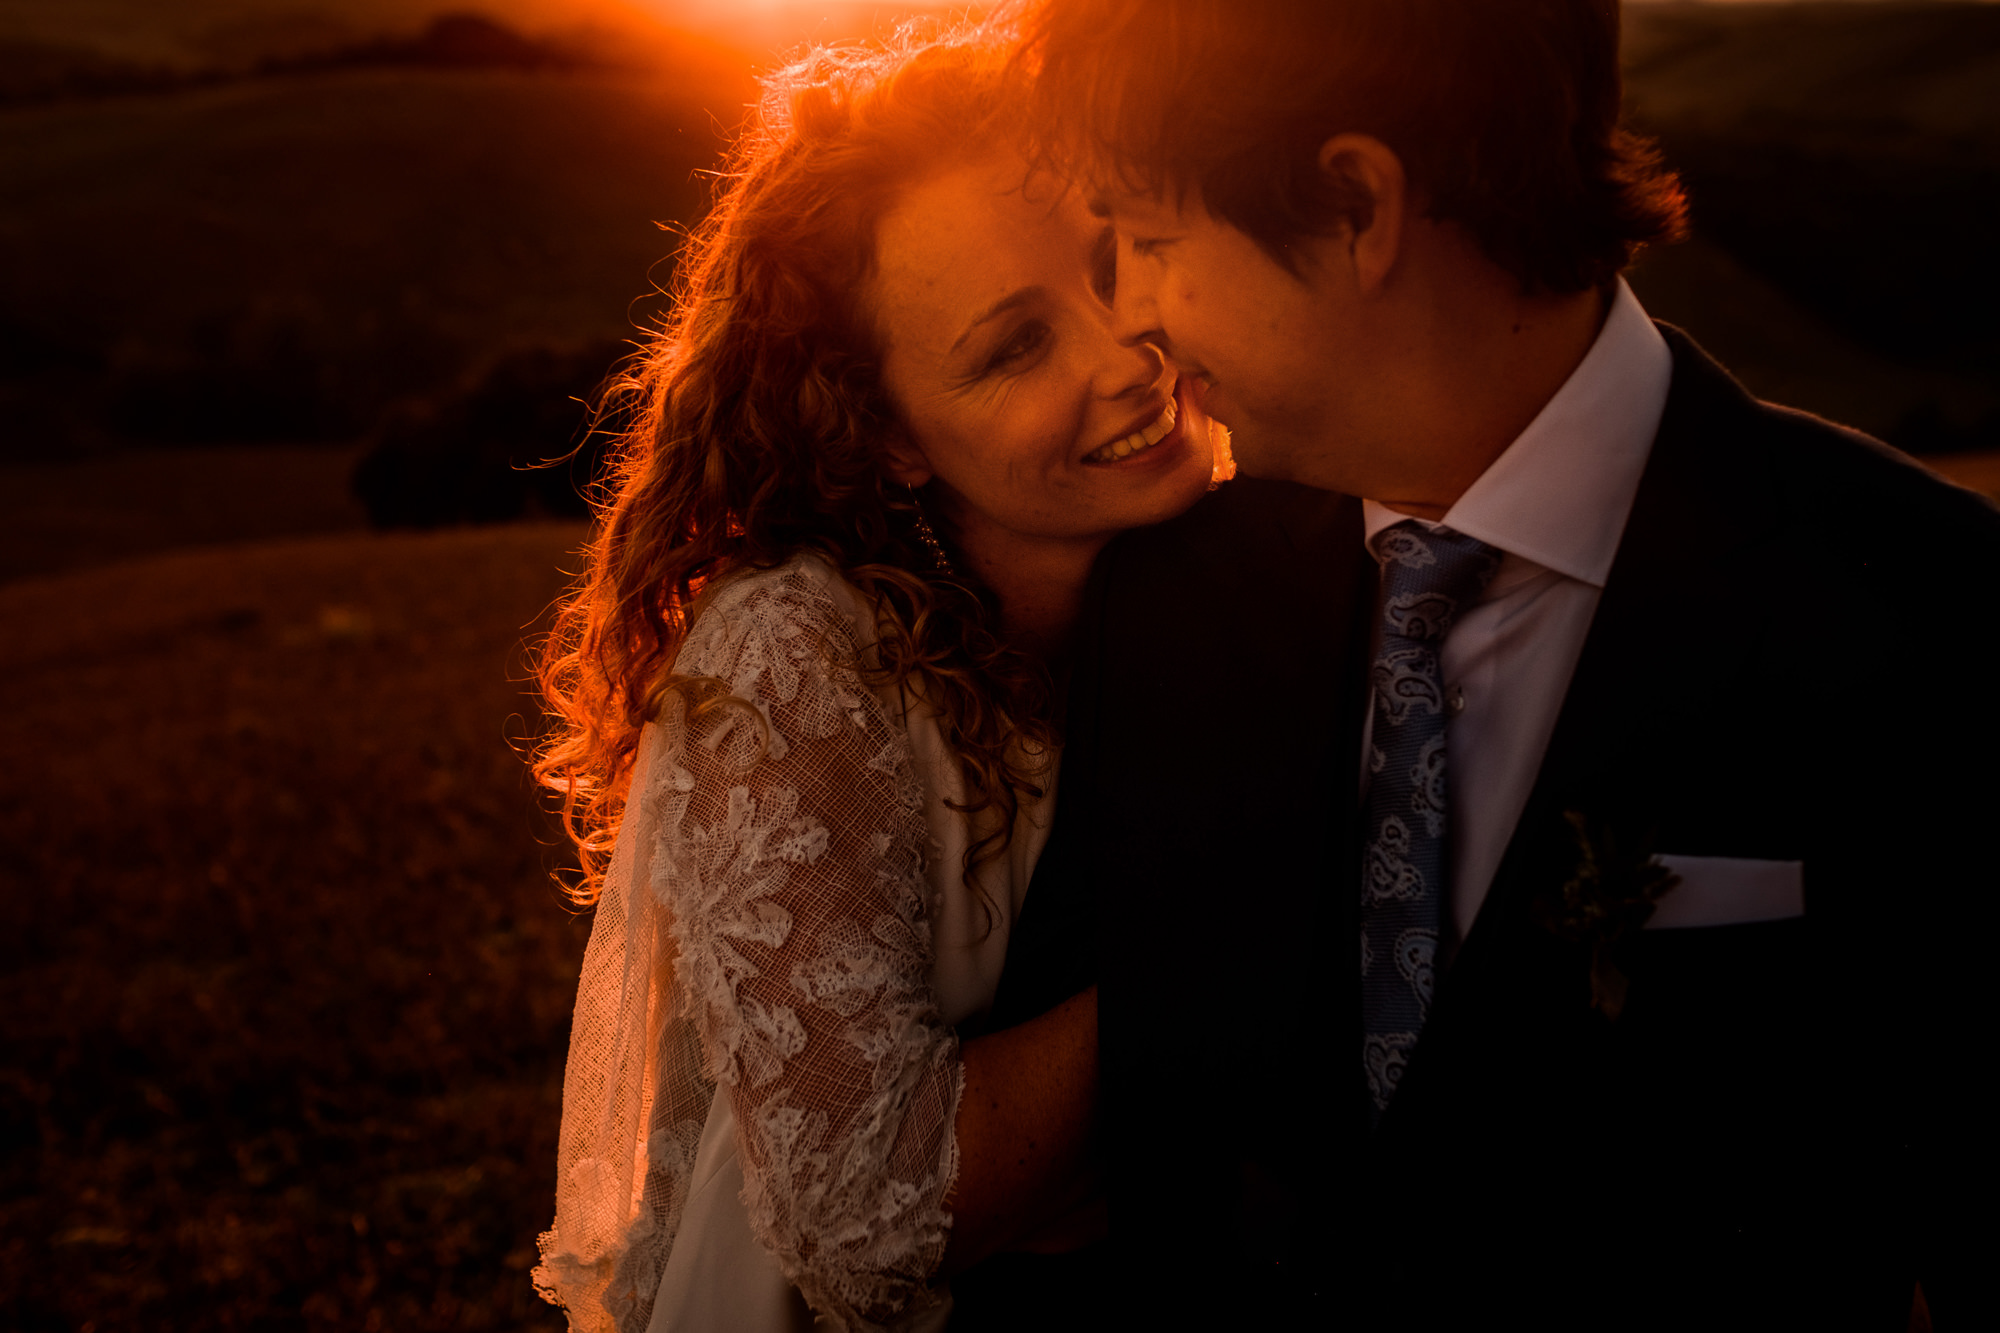 Golden hour couple portrait photo by Nordica Photography